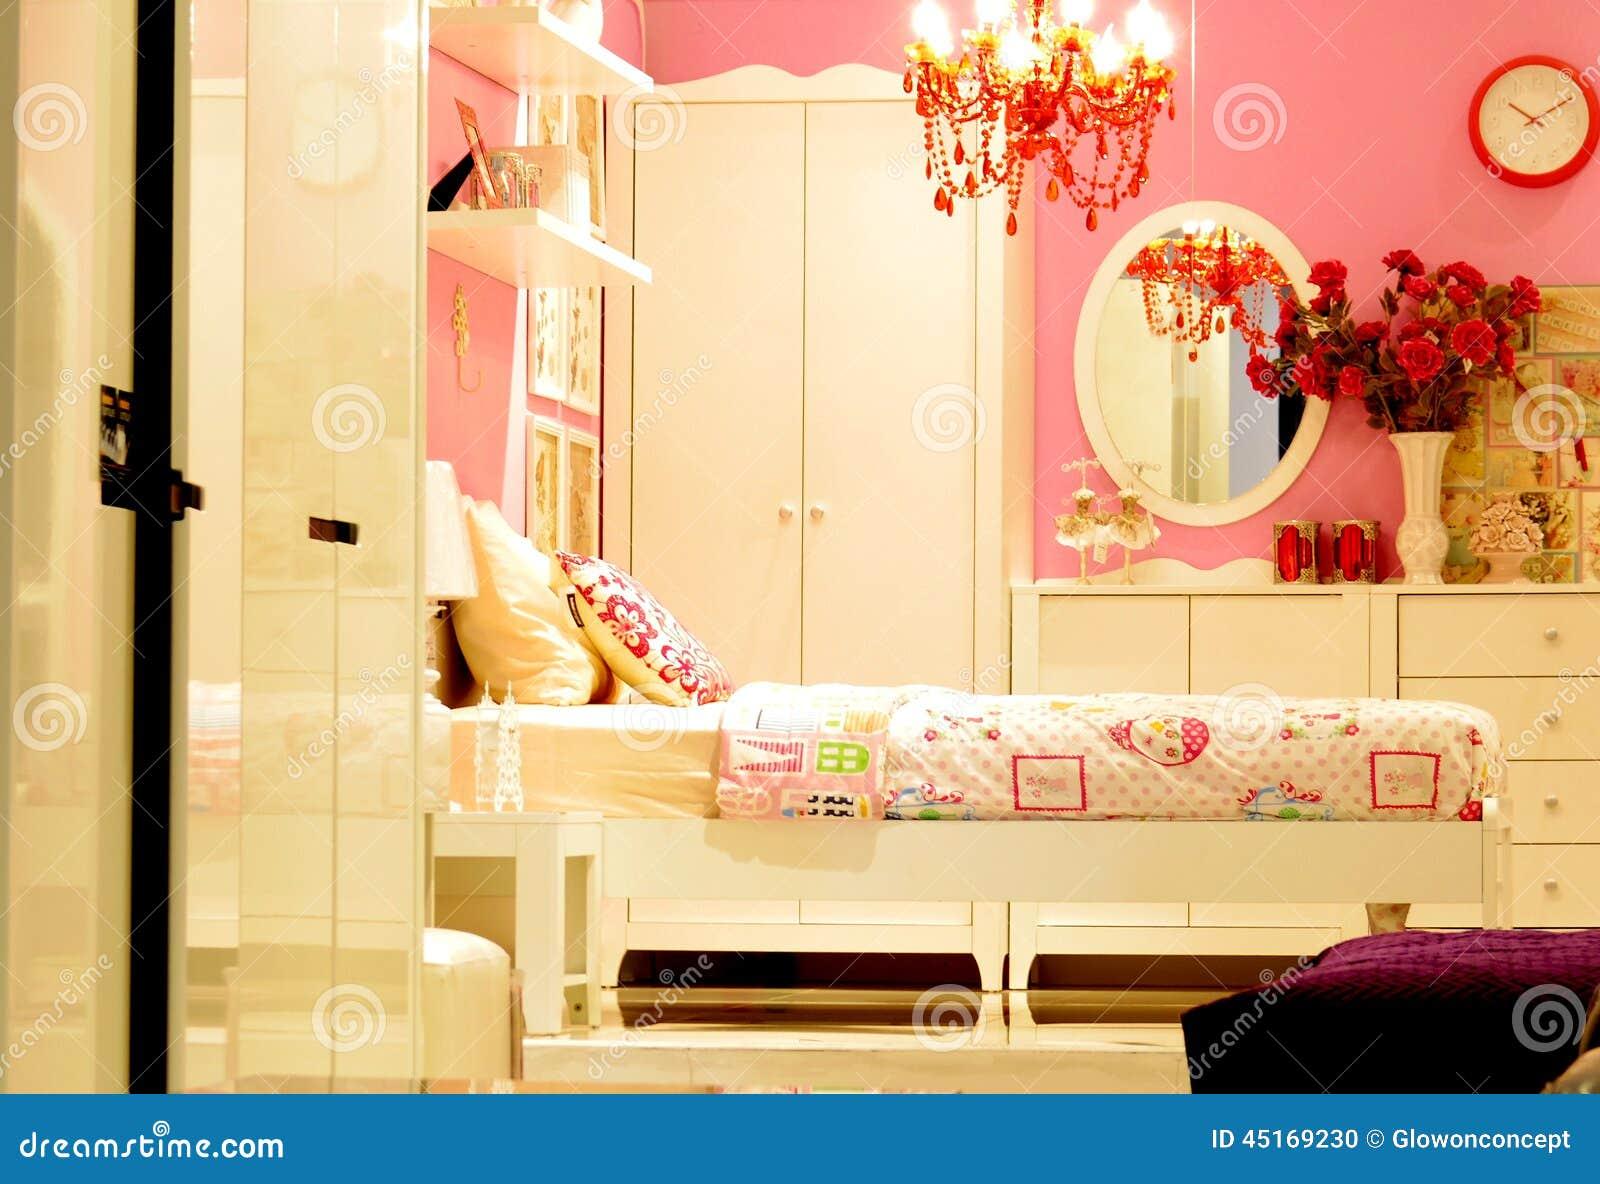 Pink Vintage Bedroom Interior Design Stock Photo - Image of design ...